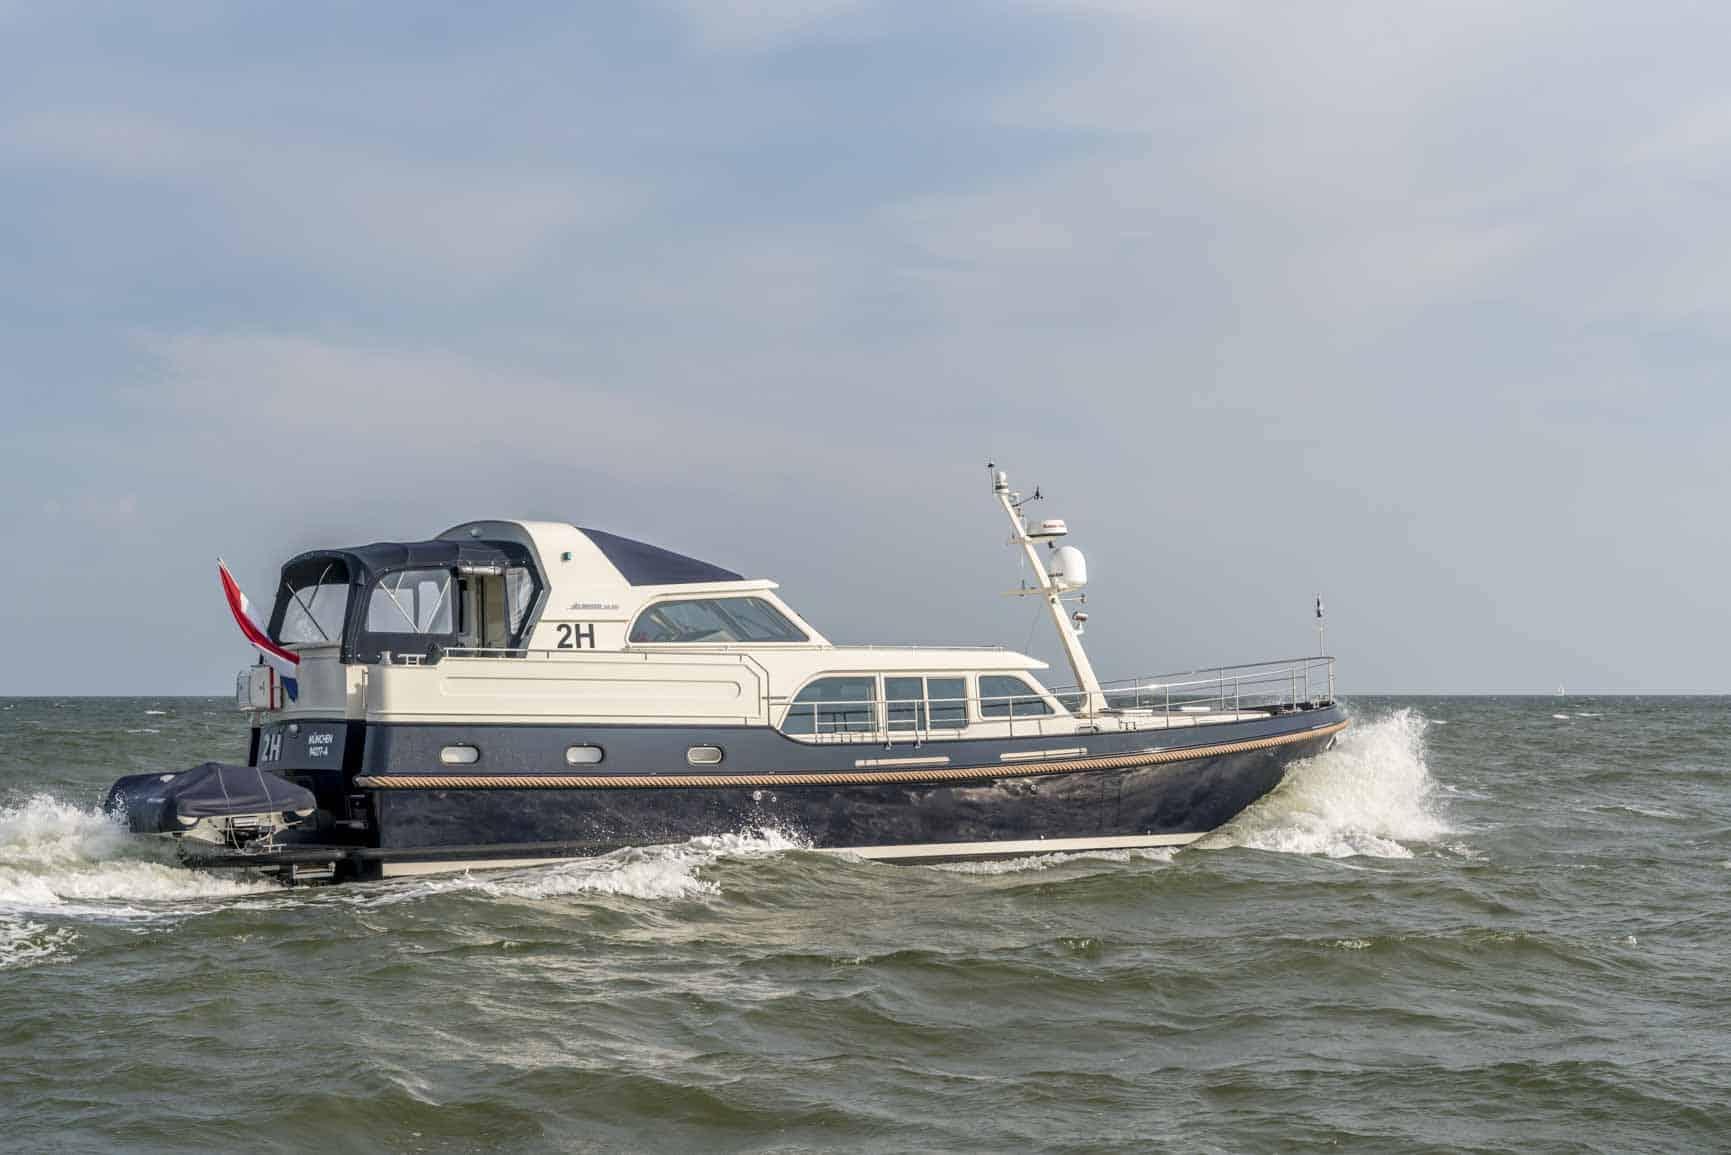 linssen-grand-sturdy-500-acvt-bnr3329-20200916-06001